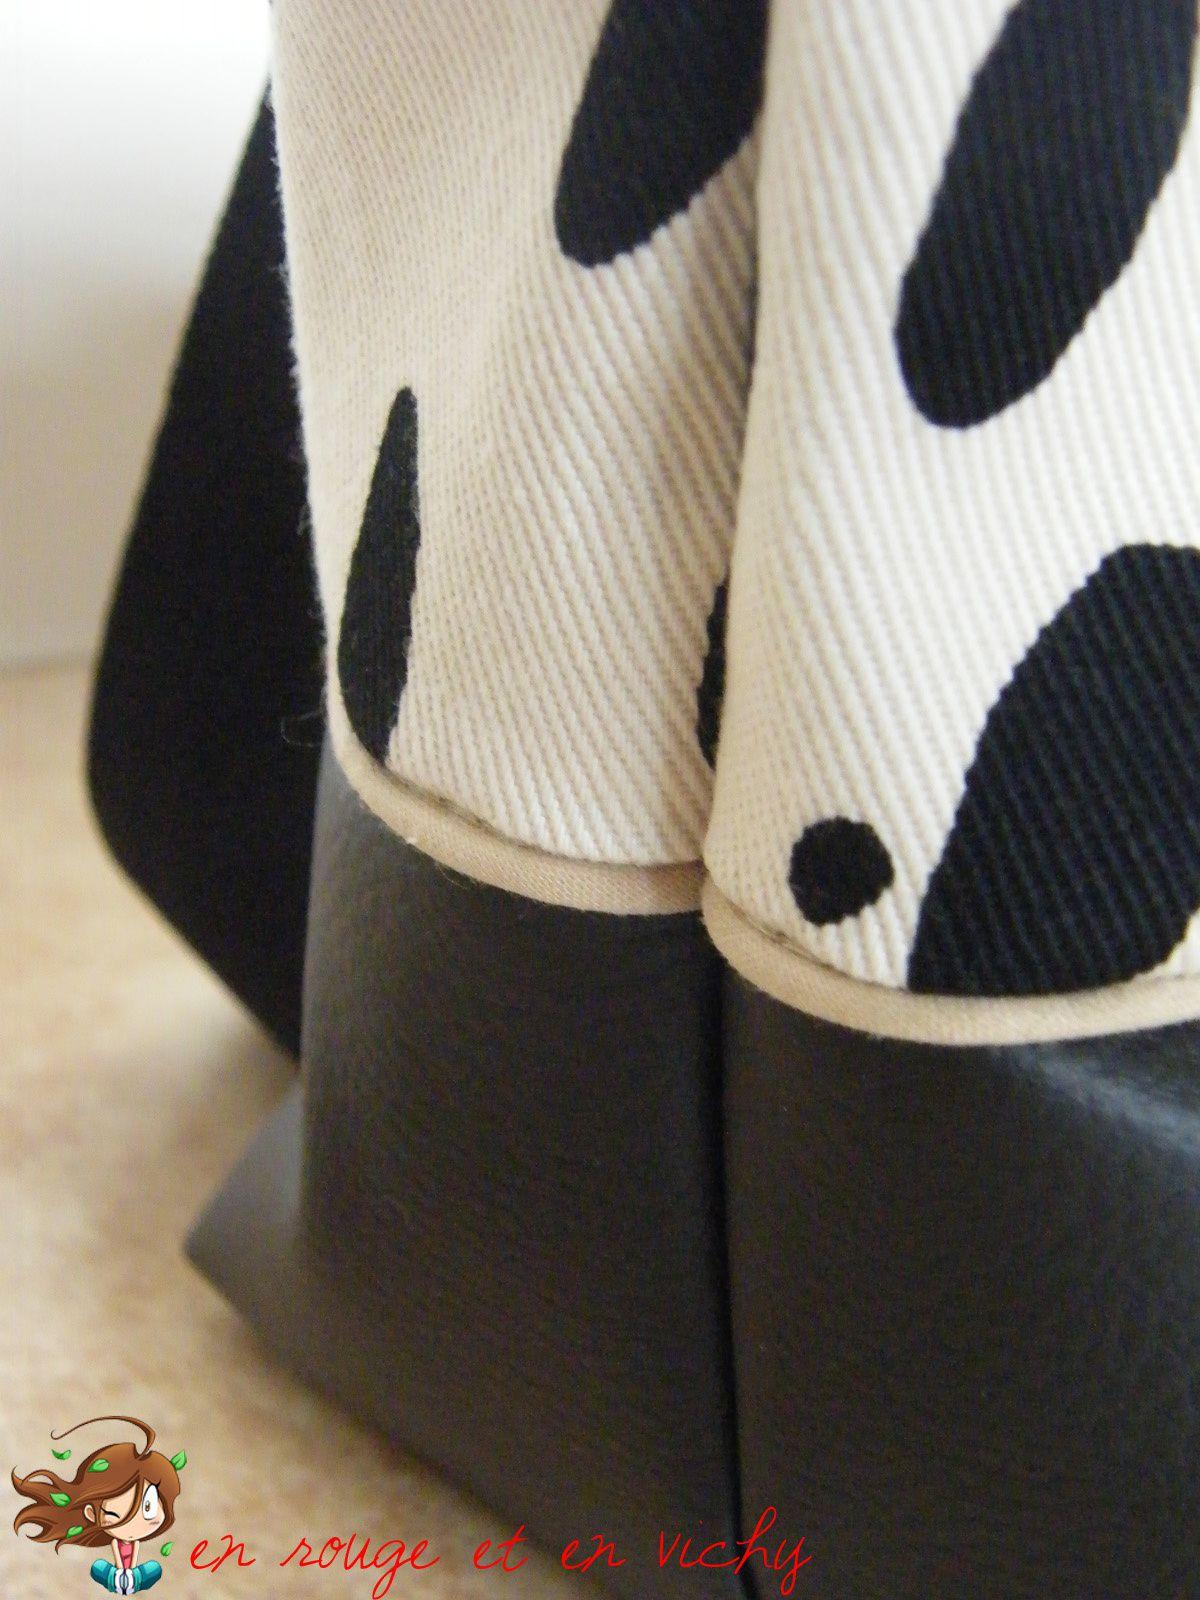 June Bag #1 en mode savane